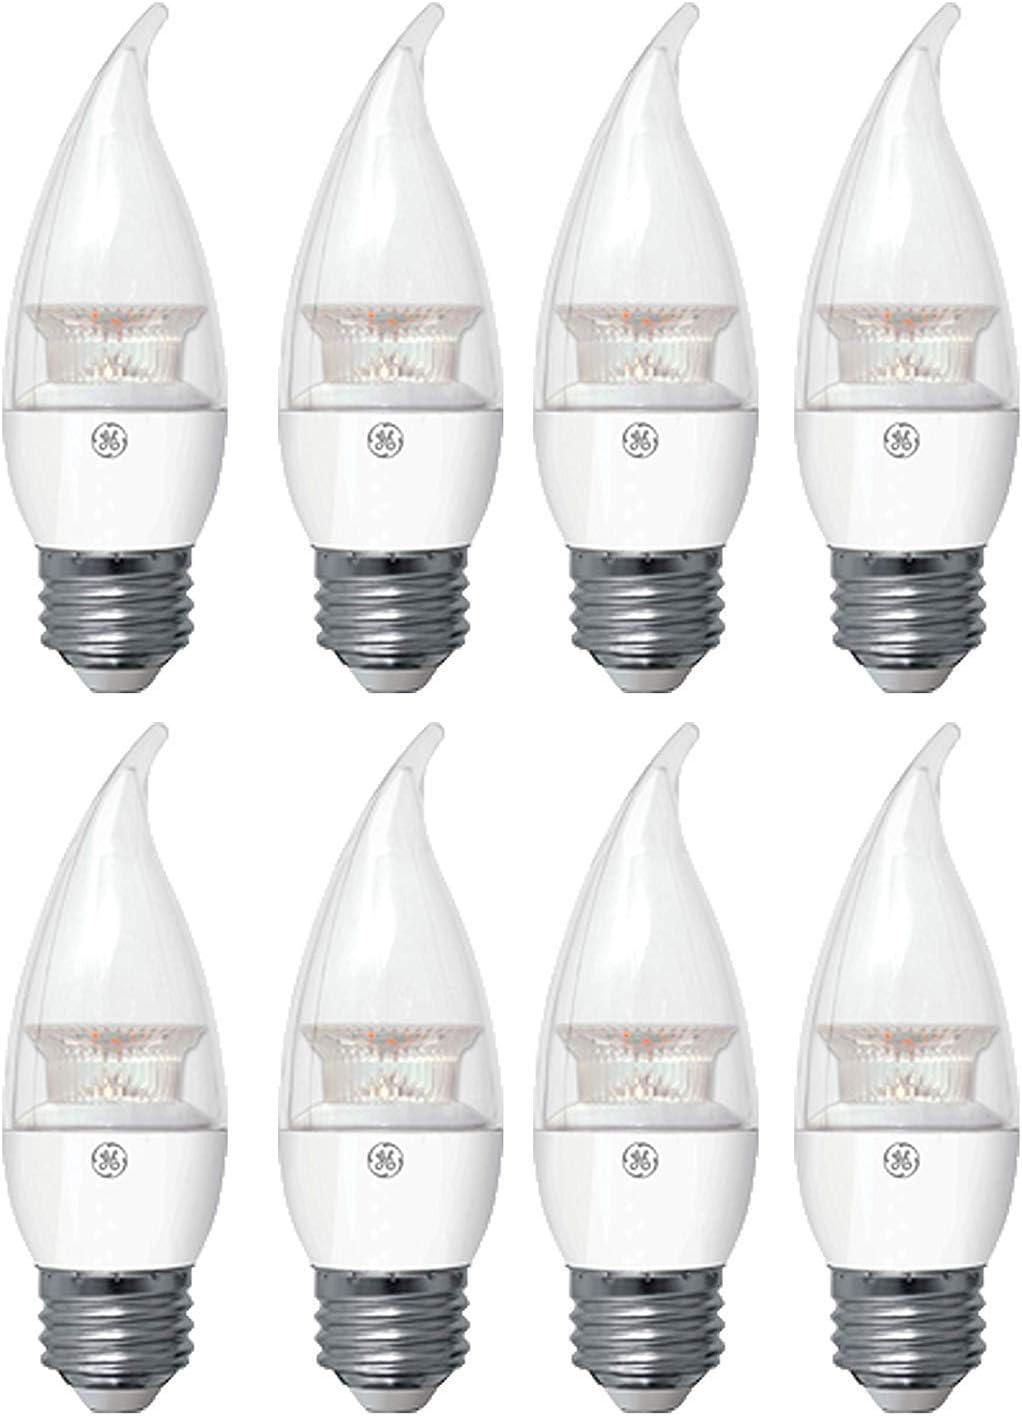 GE Lighting Refresh LED Dimmable Light Bulb (40 Watt, Medium Base, Daylight Bulb, Frosted Finish (8 Bulbs)